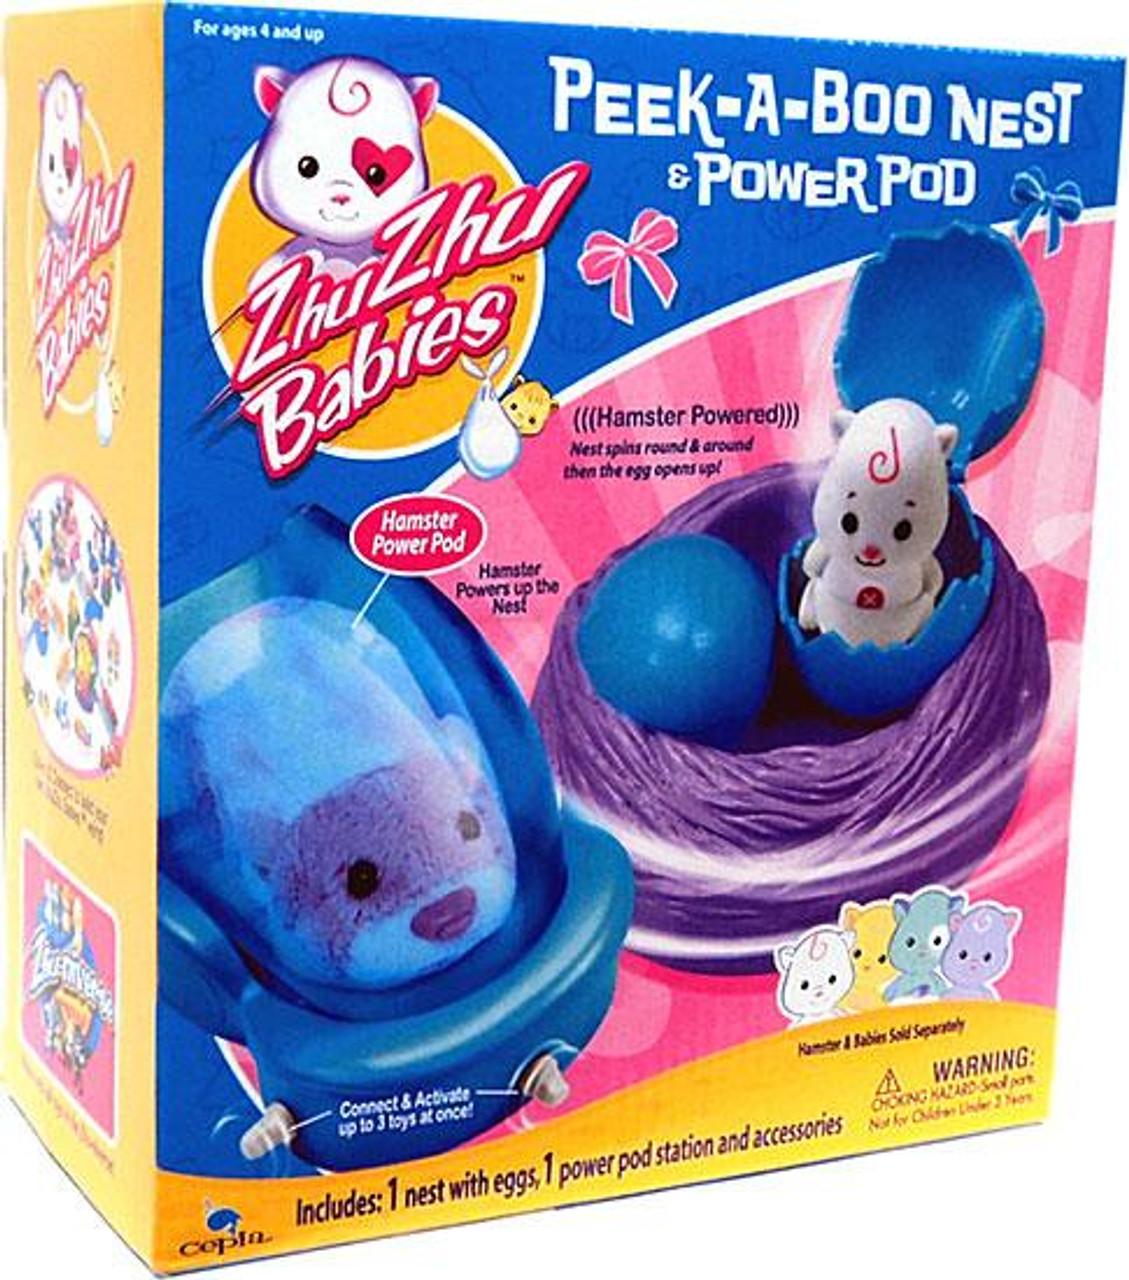 Zhu Zhu Pets Babies Peek-A-Boo Nest & Power Pod Playset